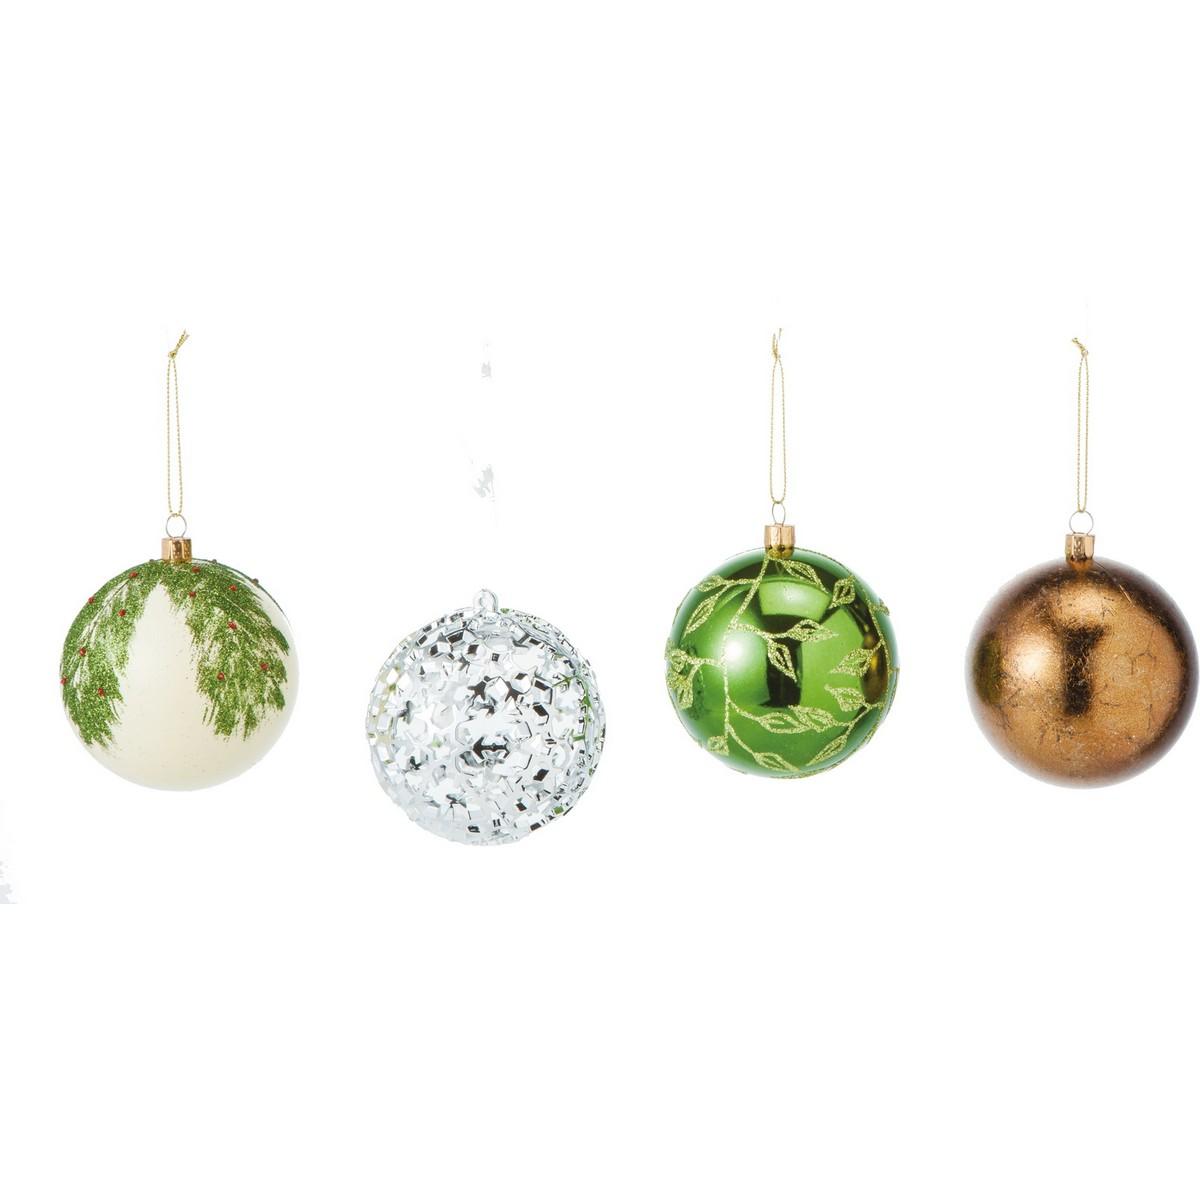 YDM/80mmネイチャーボール 4個入/COA-808【01】【取寄】《 店舗ディスプレイ クリスマス飾り ボールオーナメント 》